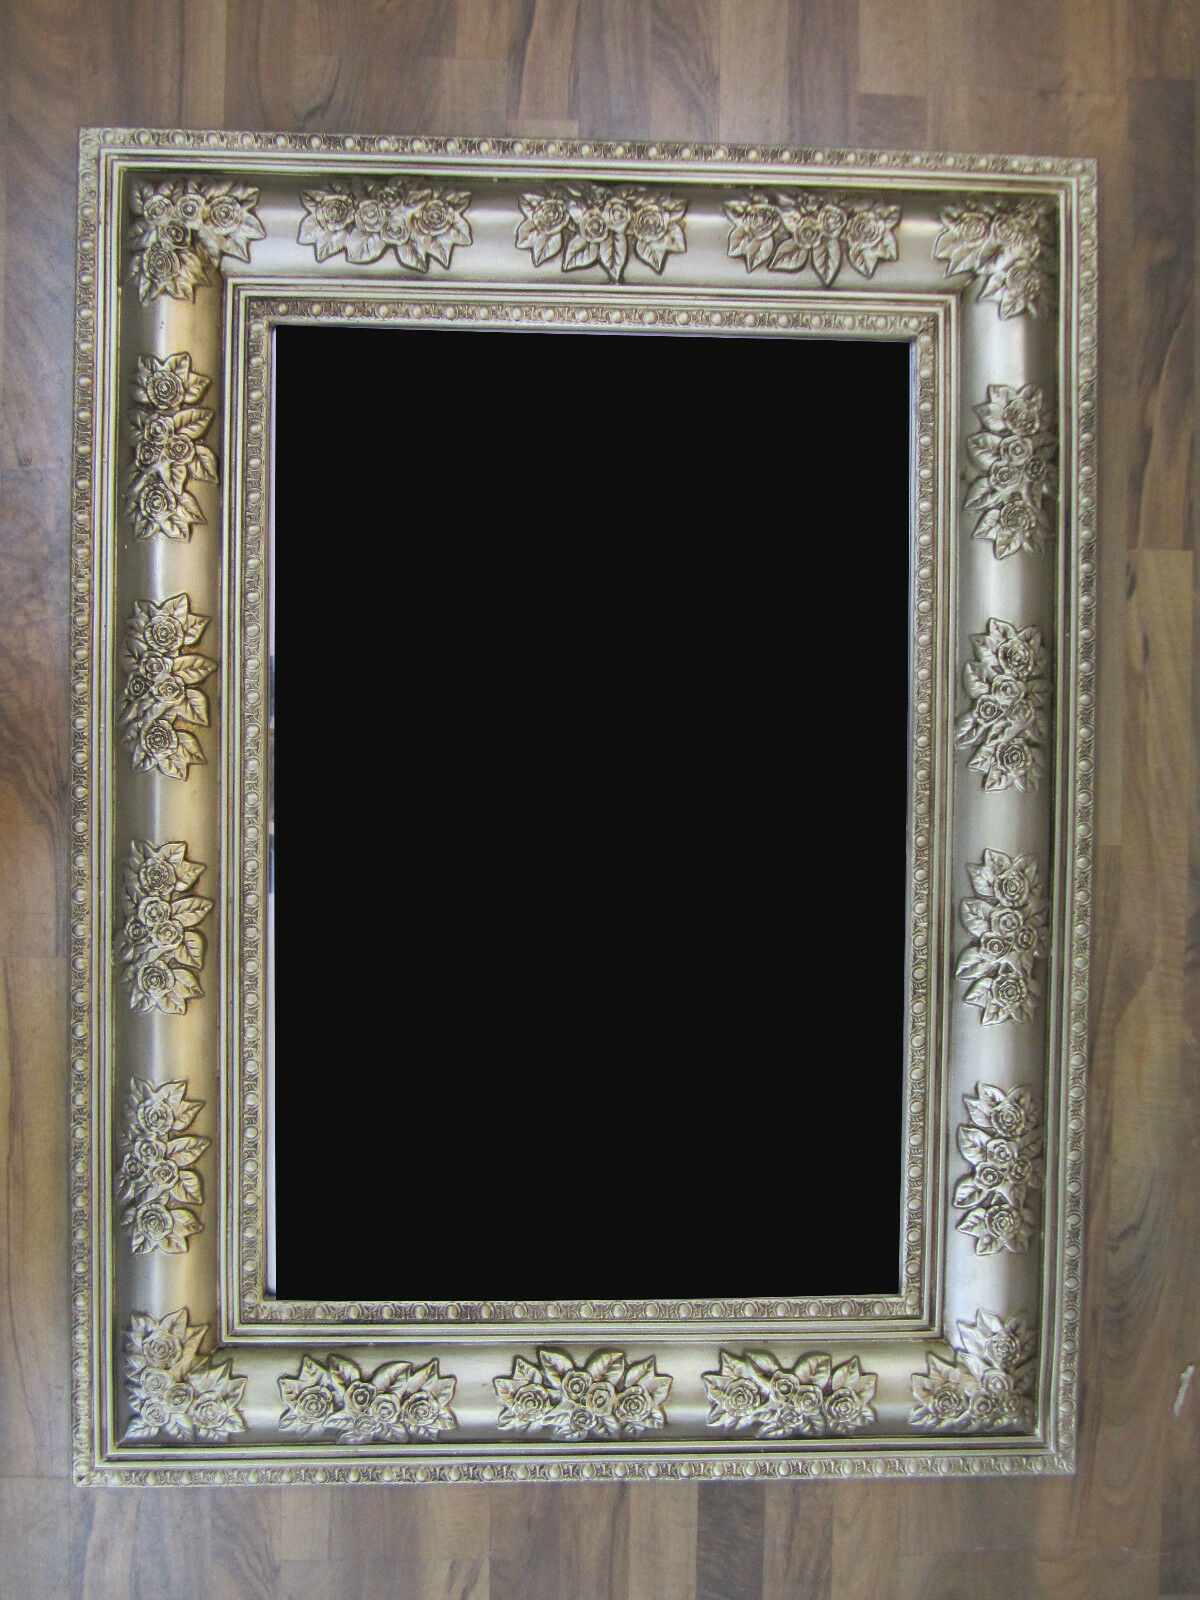 xxl bilderrahmen luxuri s prunkvoll rechteckig barock und rokoko antik 122x92 ebay. Black Bedroom Furniture Sets. Home Design Ideas